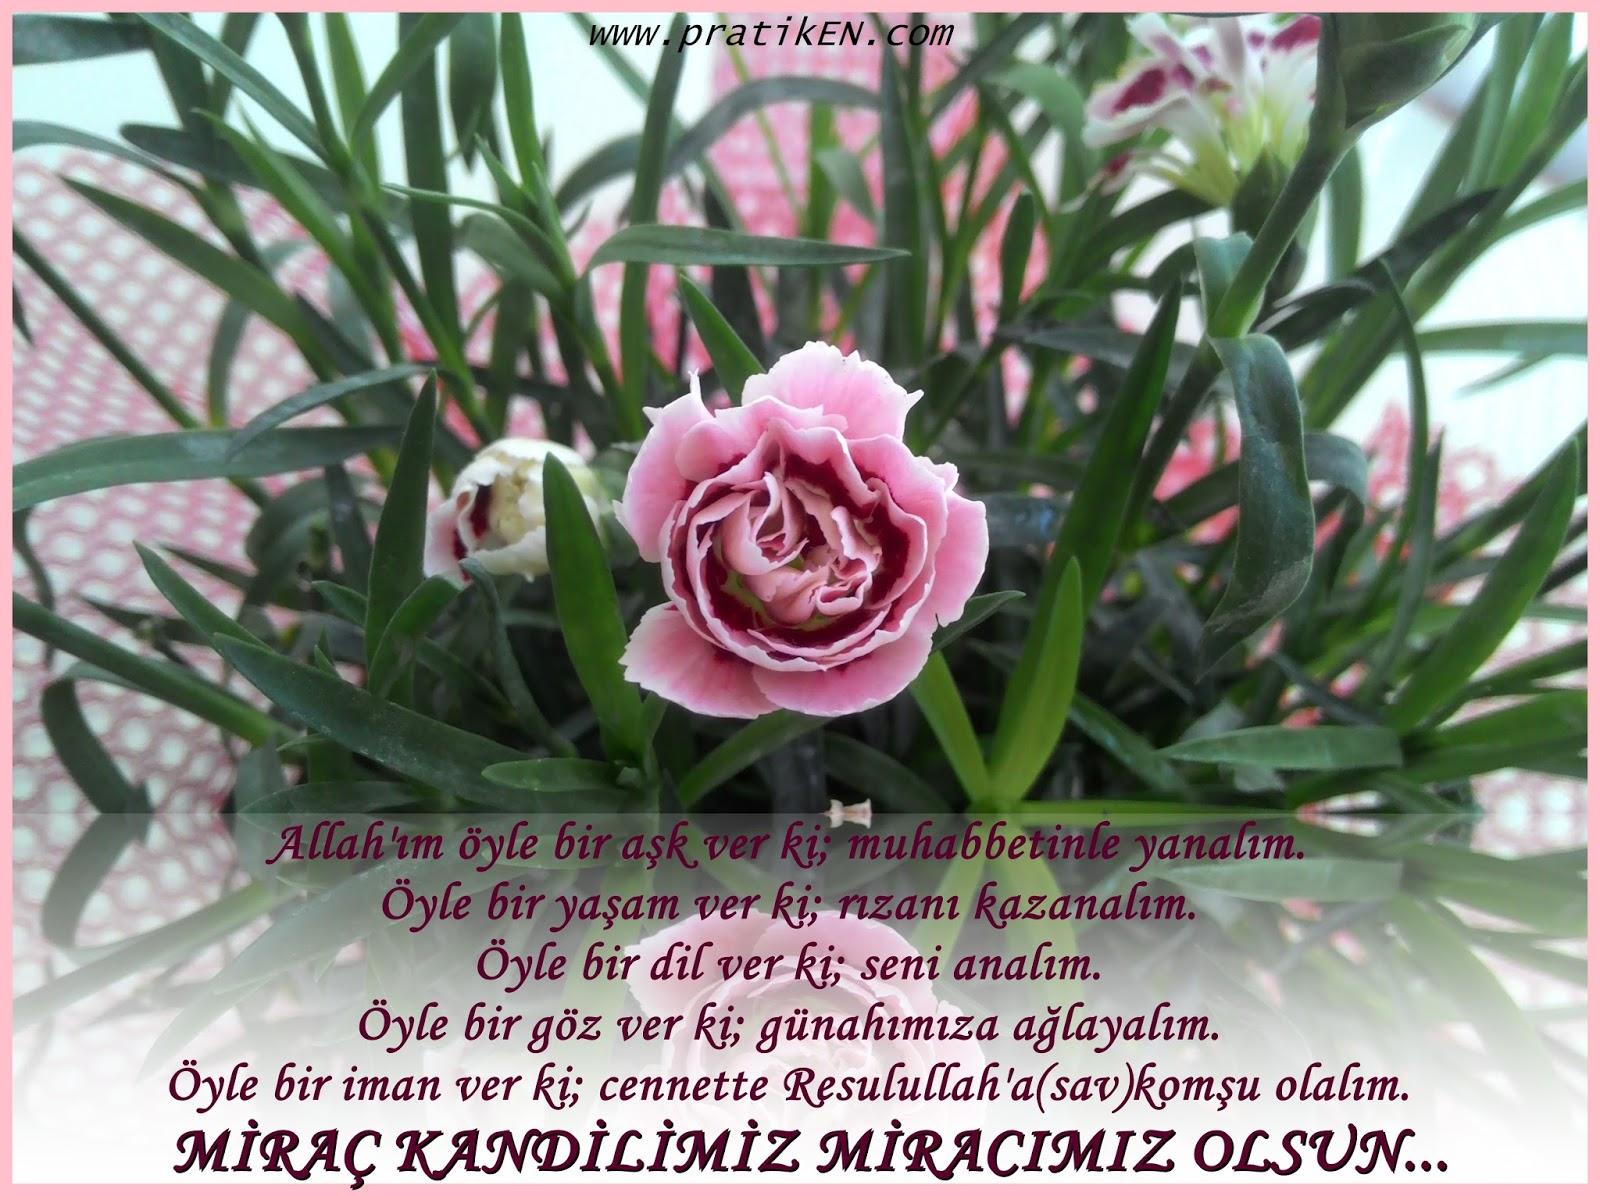 Miraç kandil duaları facebook paylaş